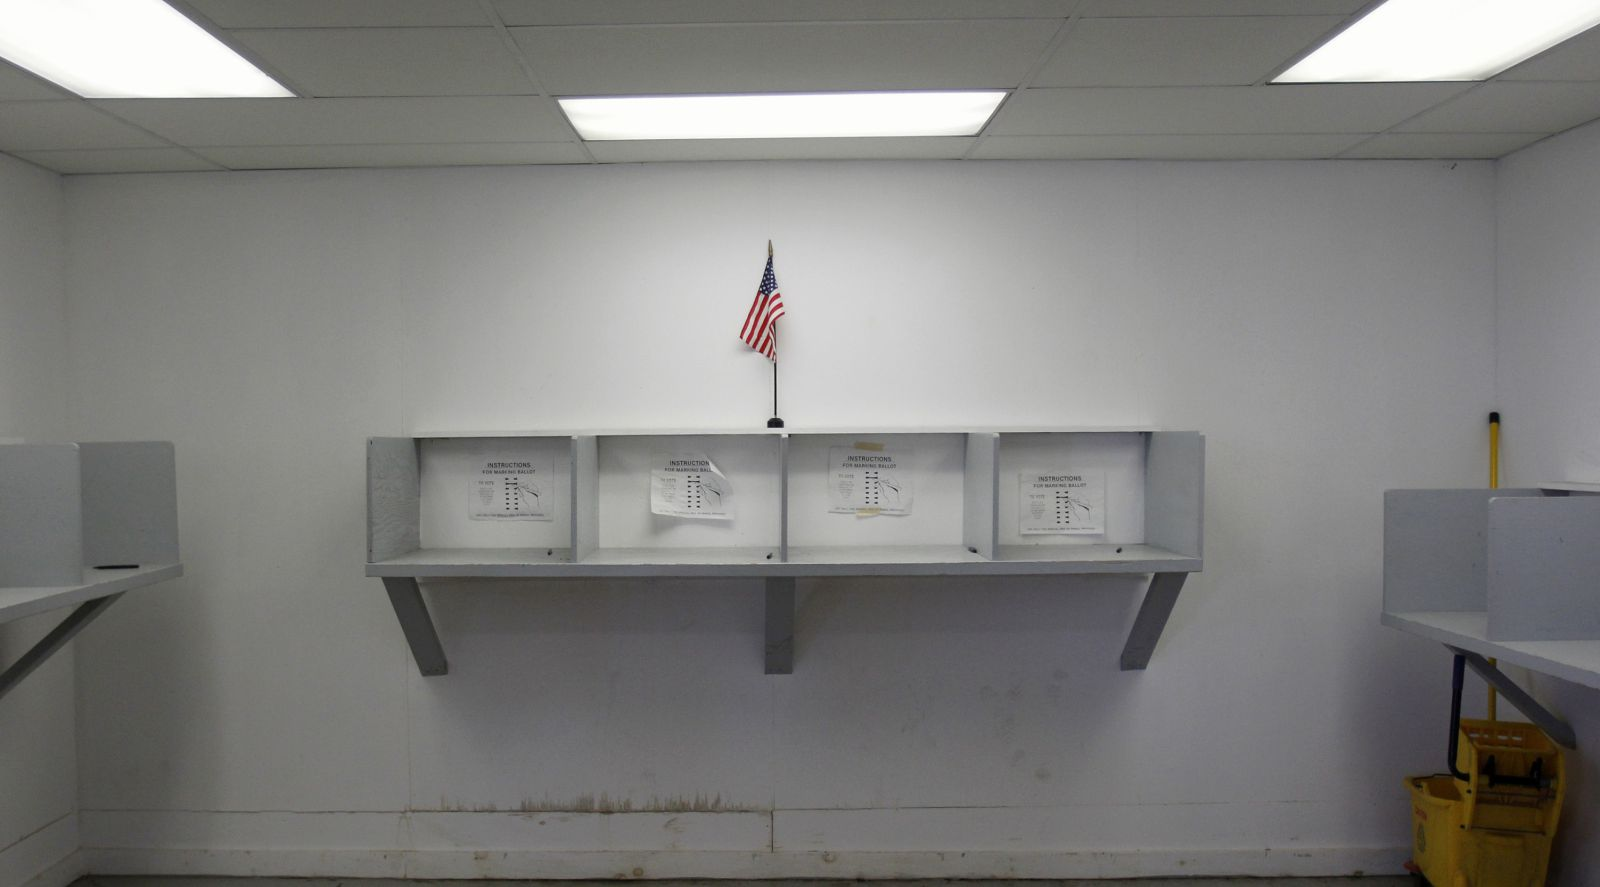 Empty polling place (Reuters/Jessica Rinaldi)